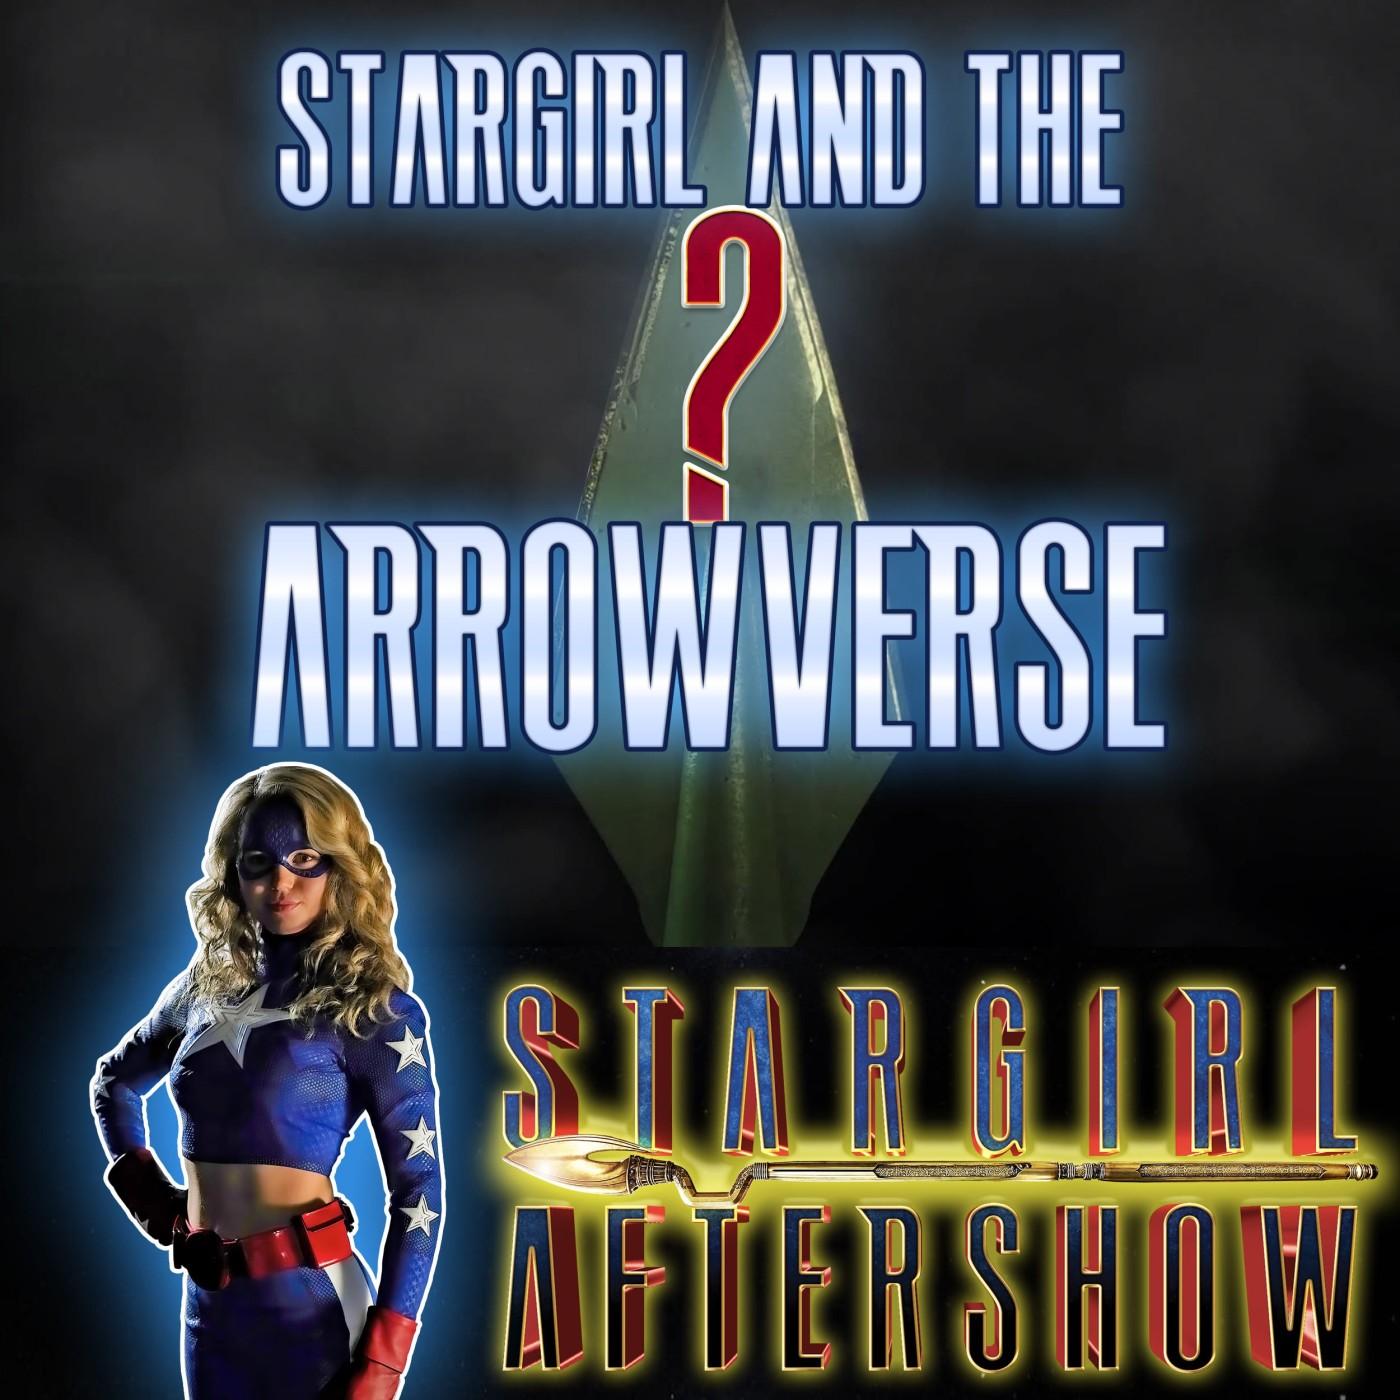 STARGIRL Season 0 – Episode 8: The Arrowverse?